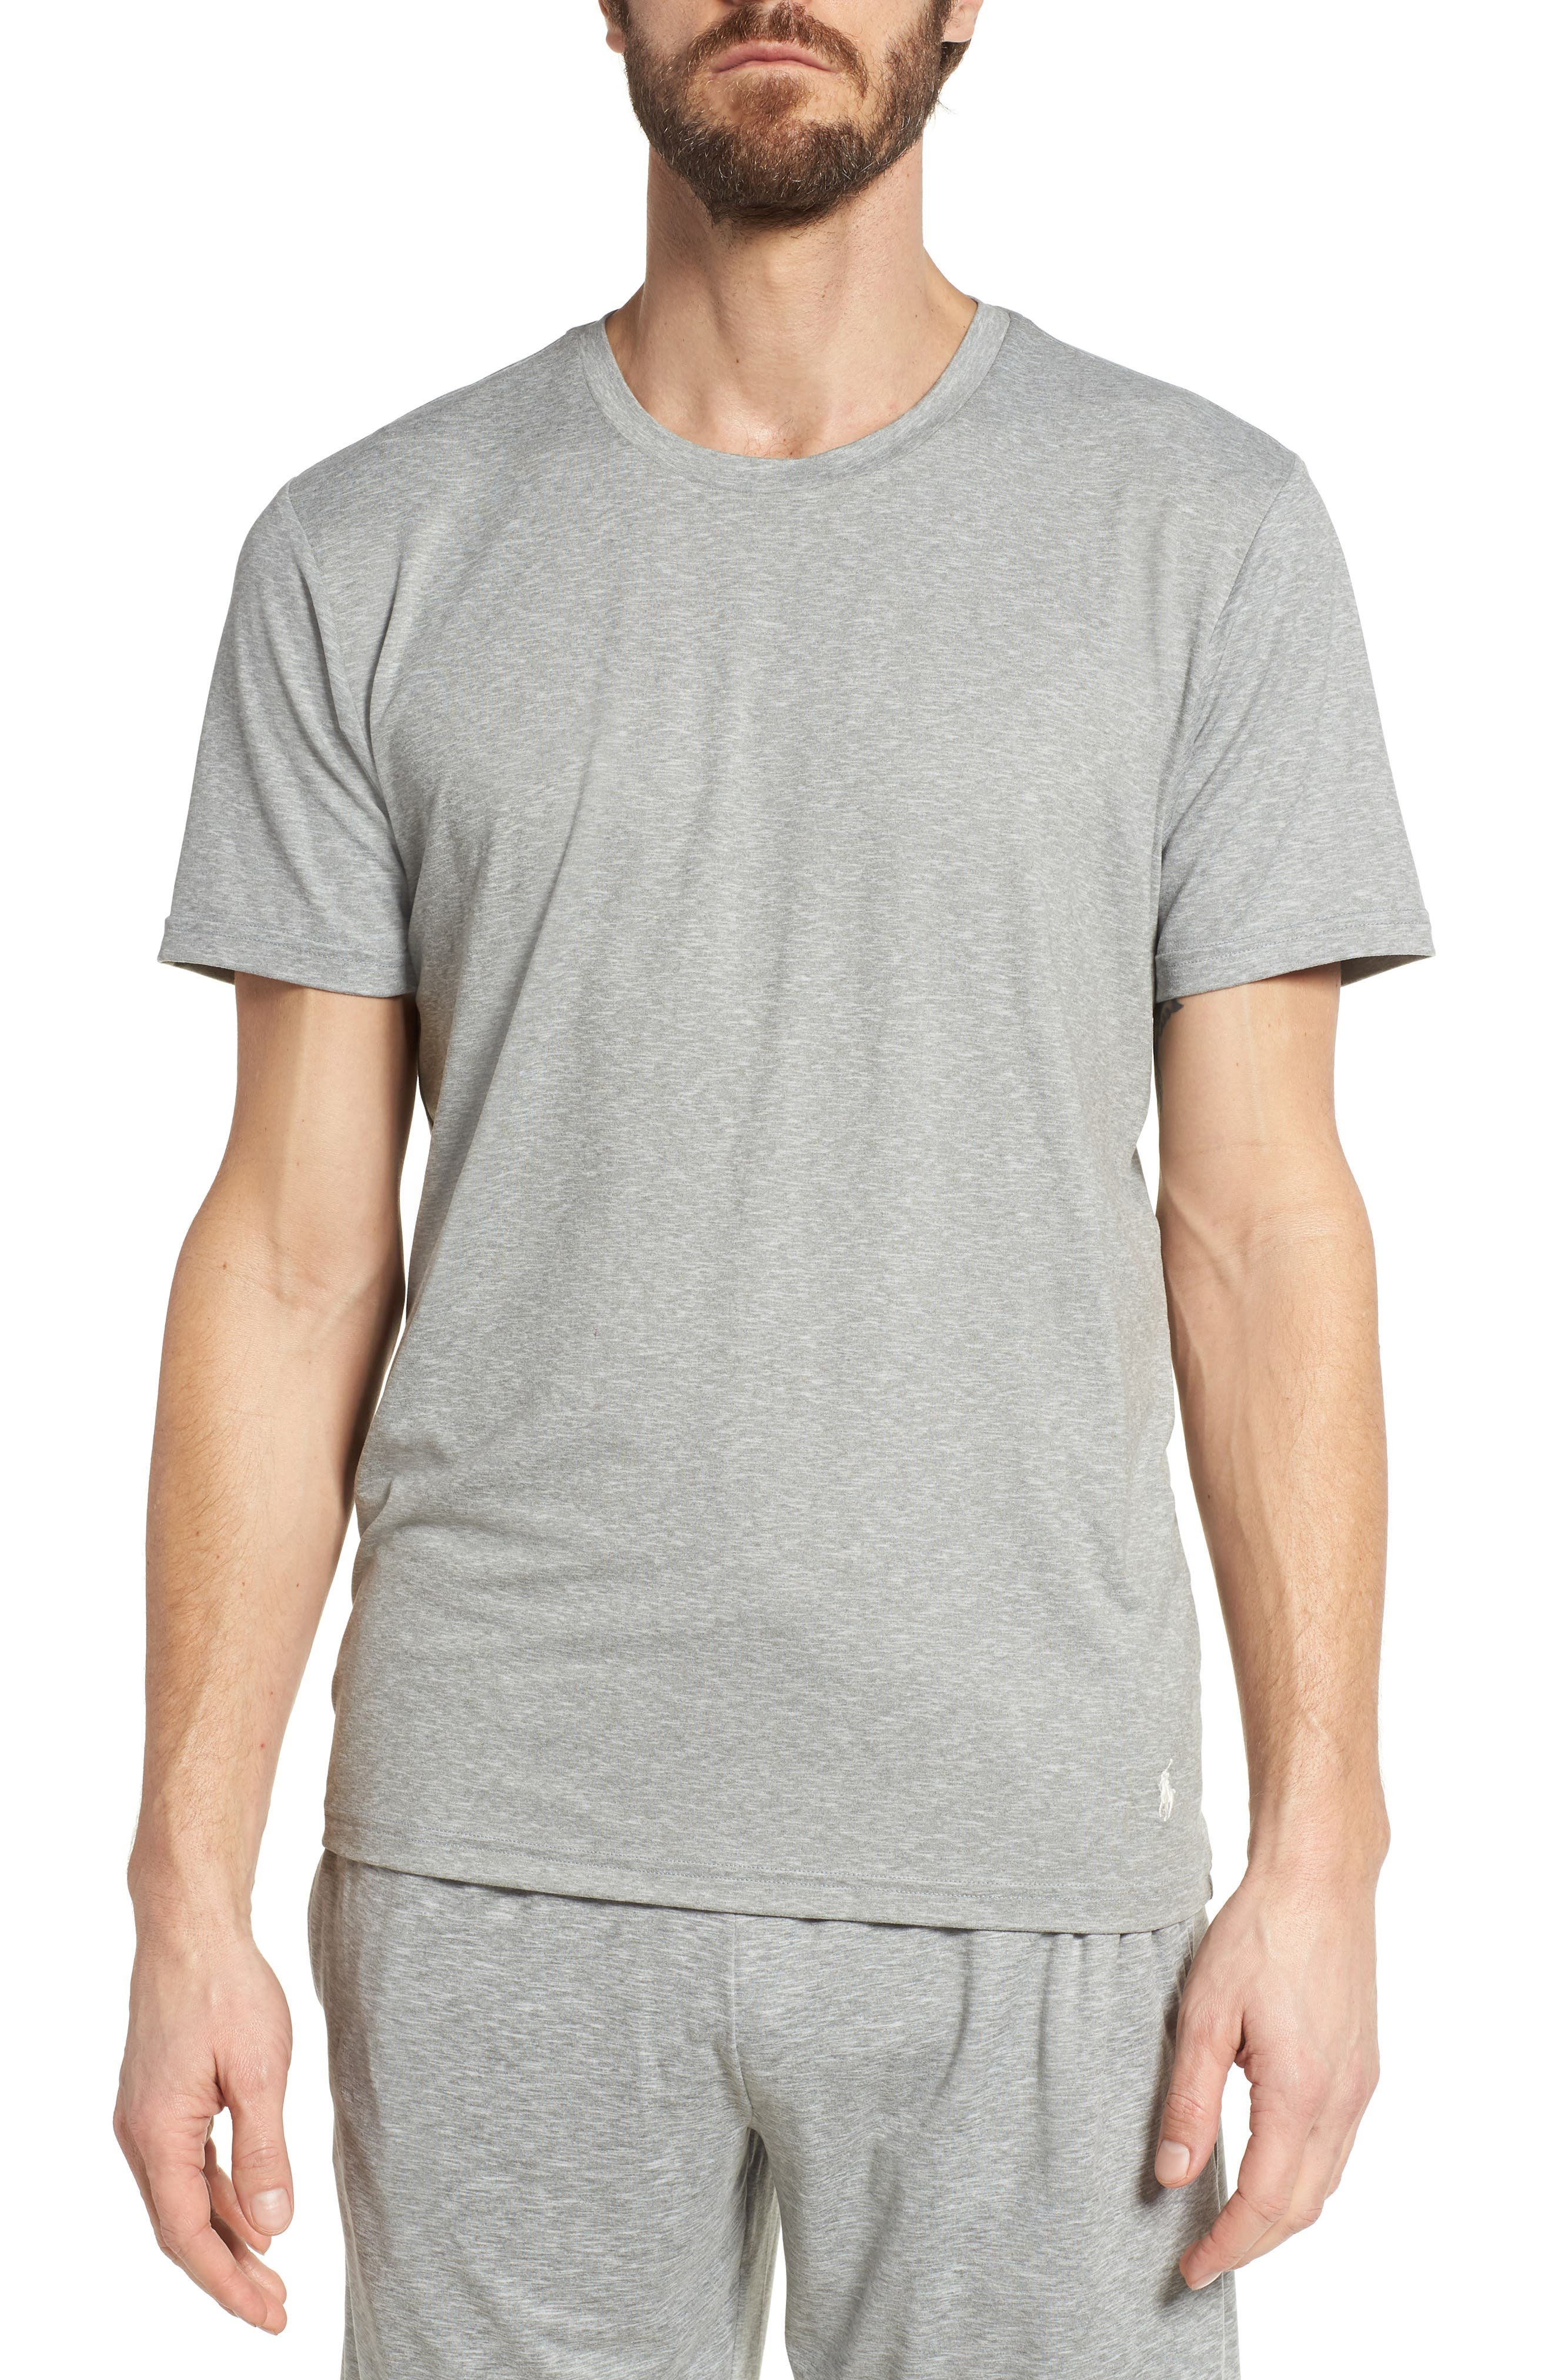 Therma Sleep Crewneck T-Shirt,                             Main thumbnail 1, color,                             Andover Heather/ Nevis